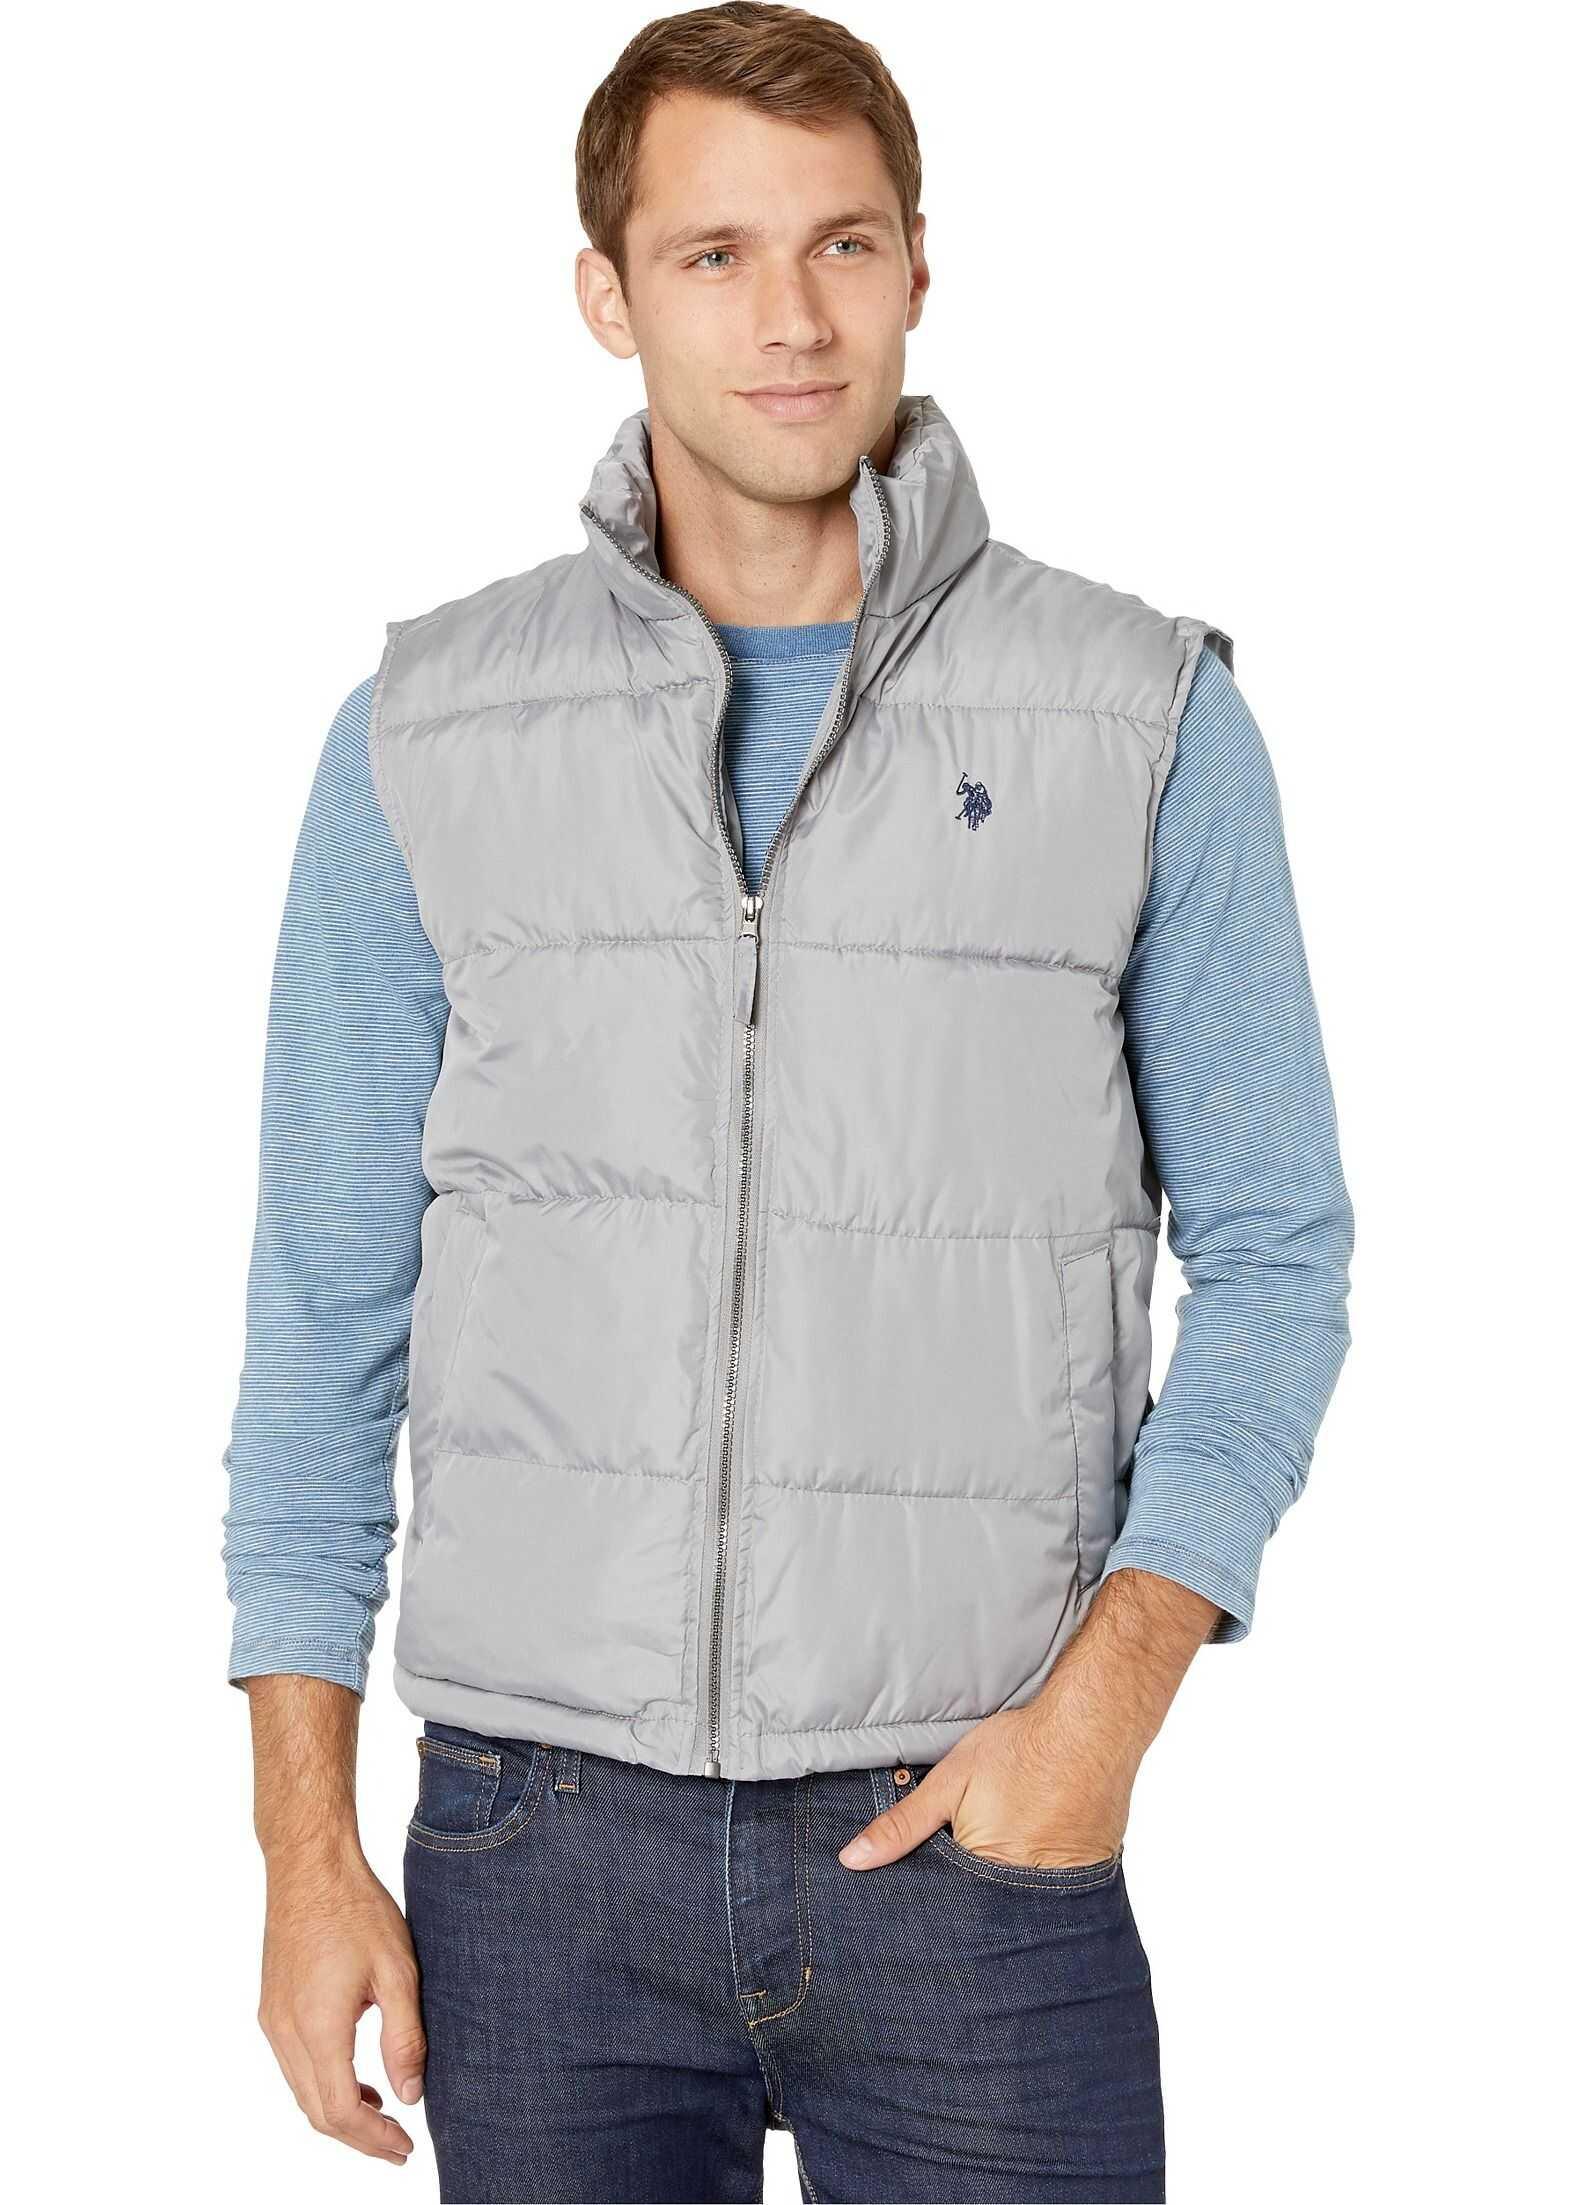 U.S. POLO ASSN. Signature Vest Vapor Grey